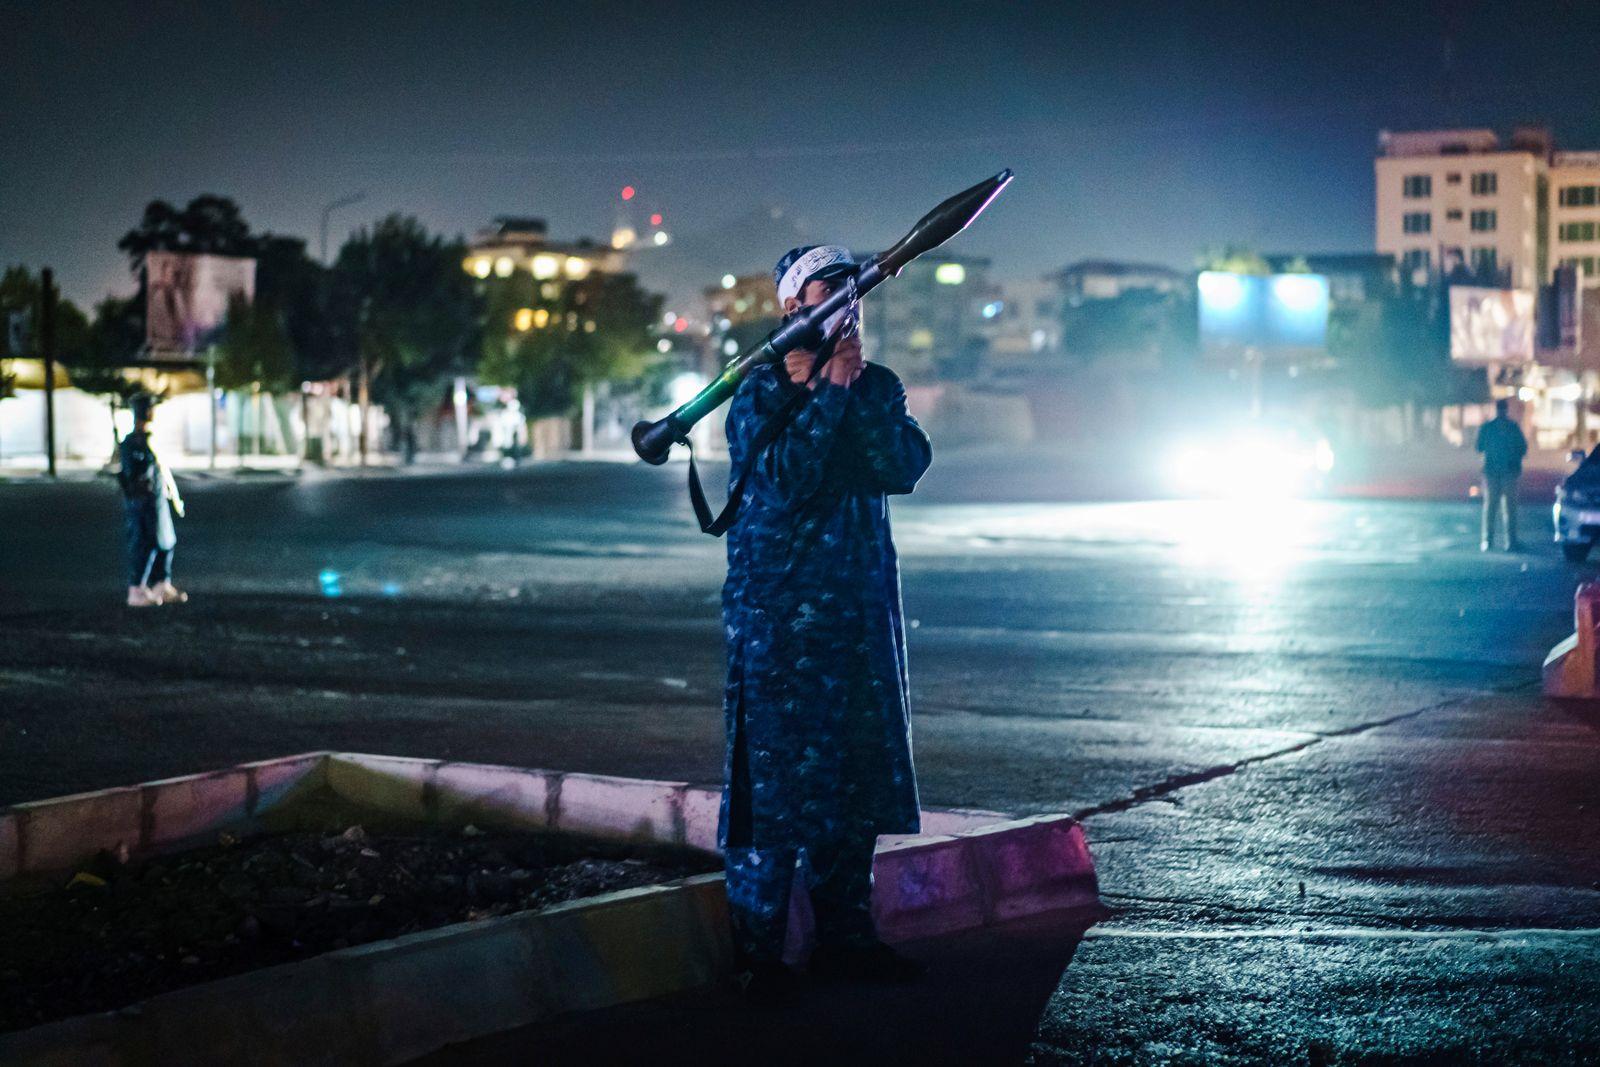 TALIBAN POLICE KABUL